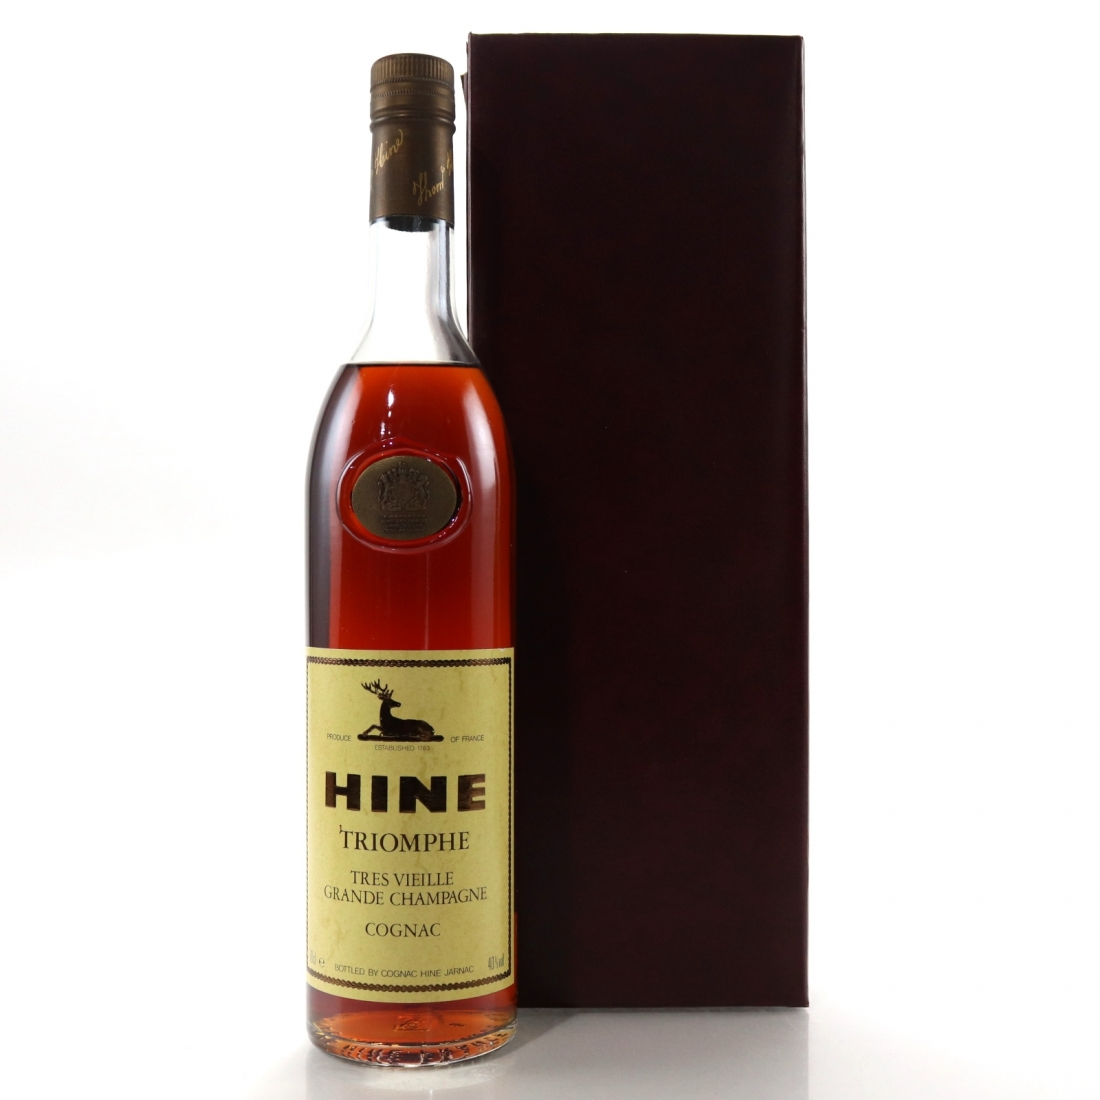 Hine Triomphe Grand Champagne Cognac 1980s / German Import